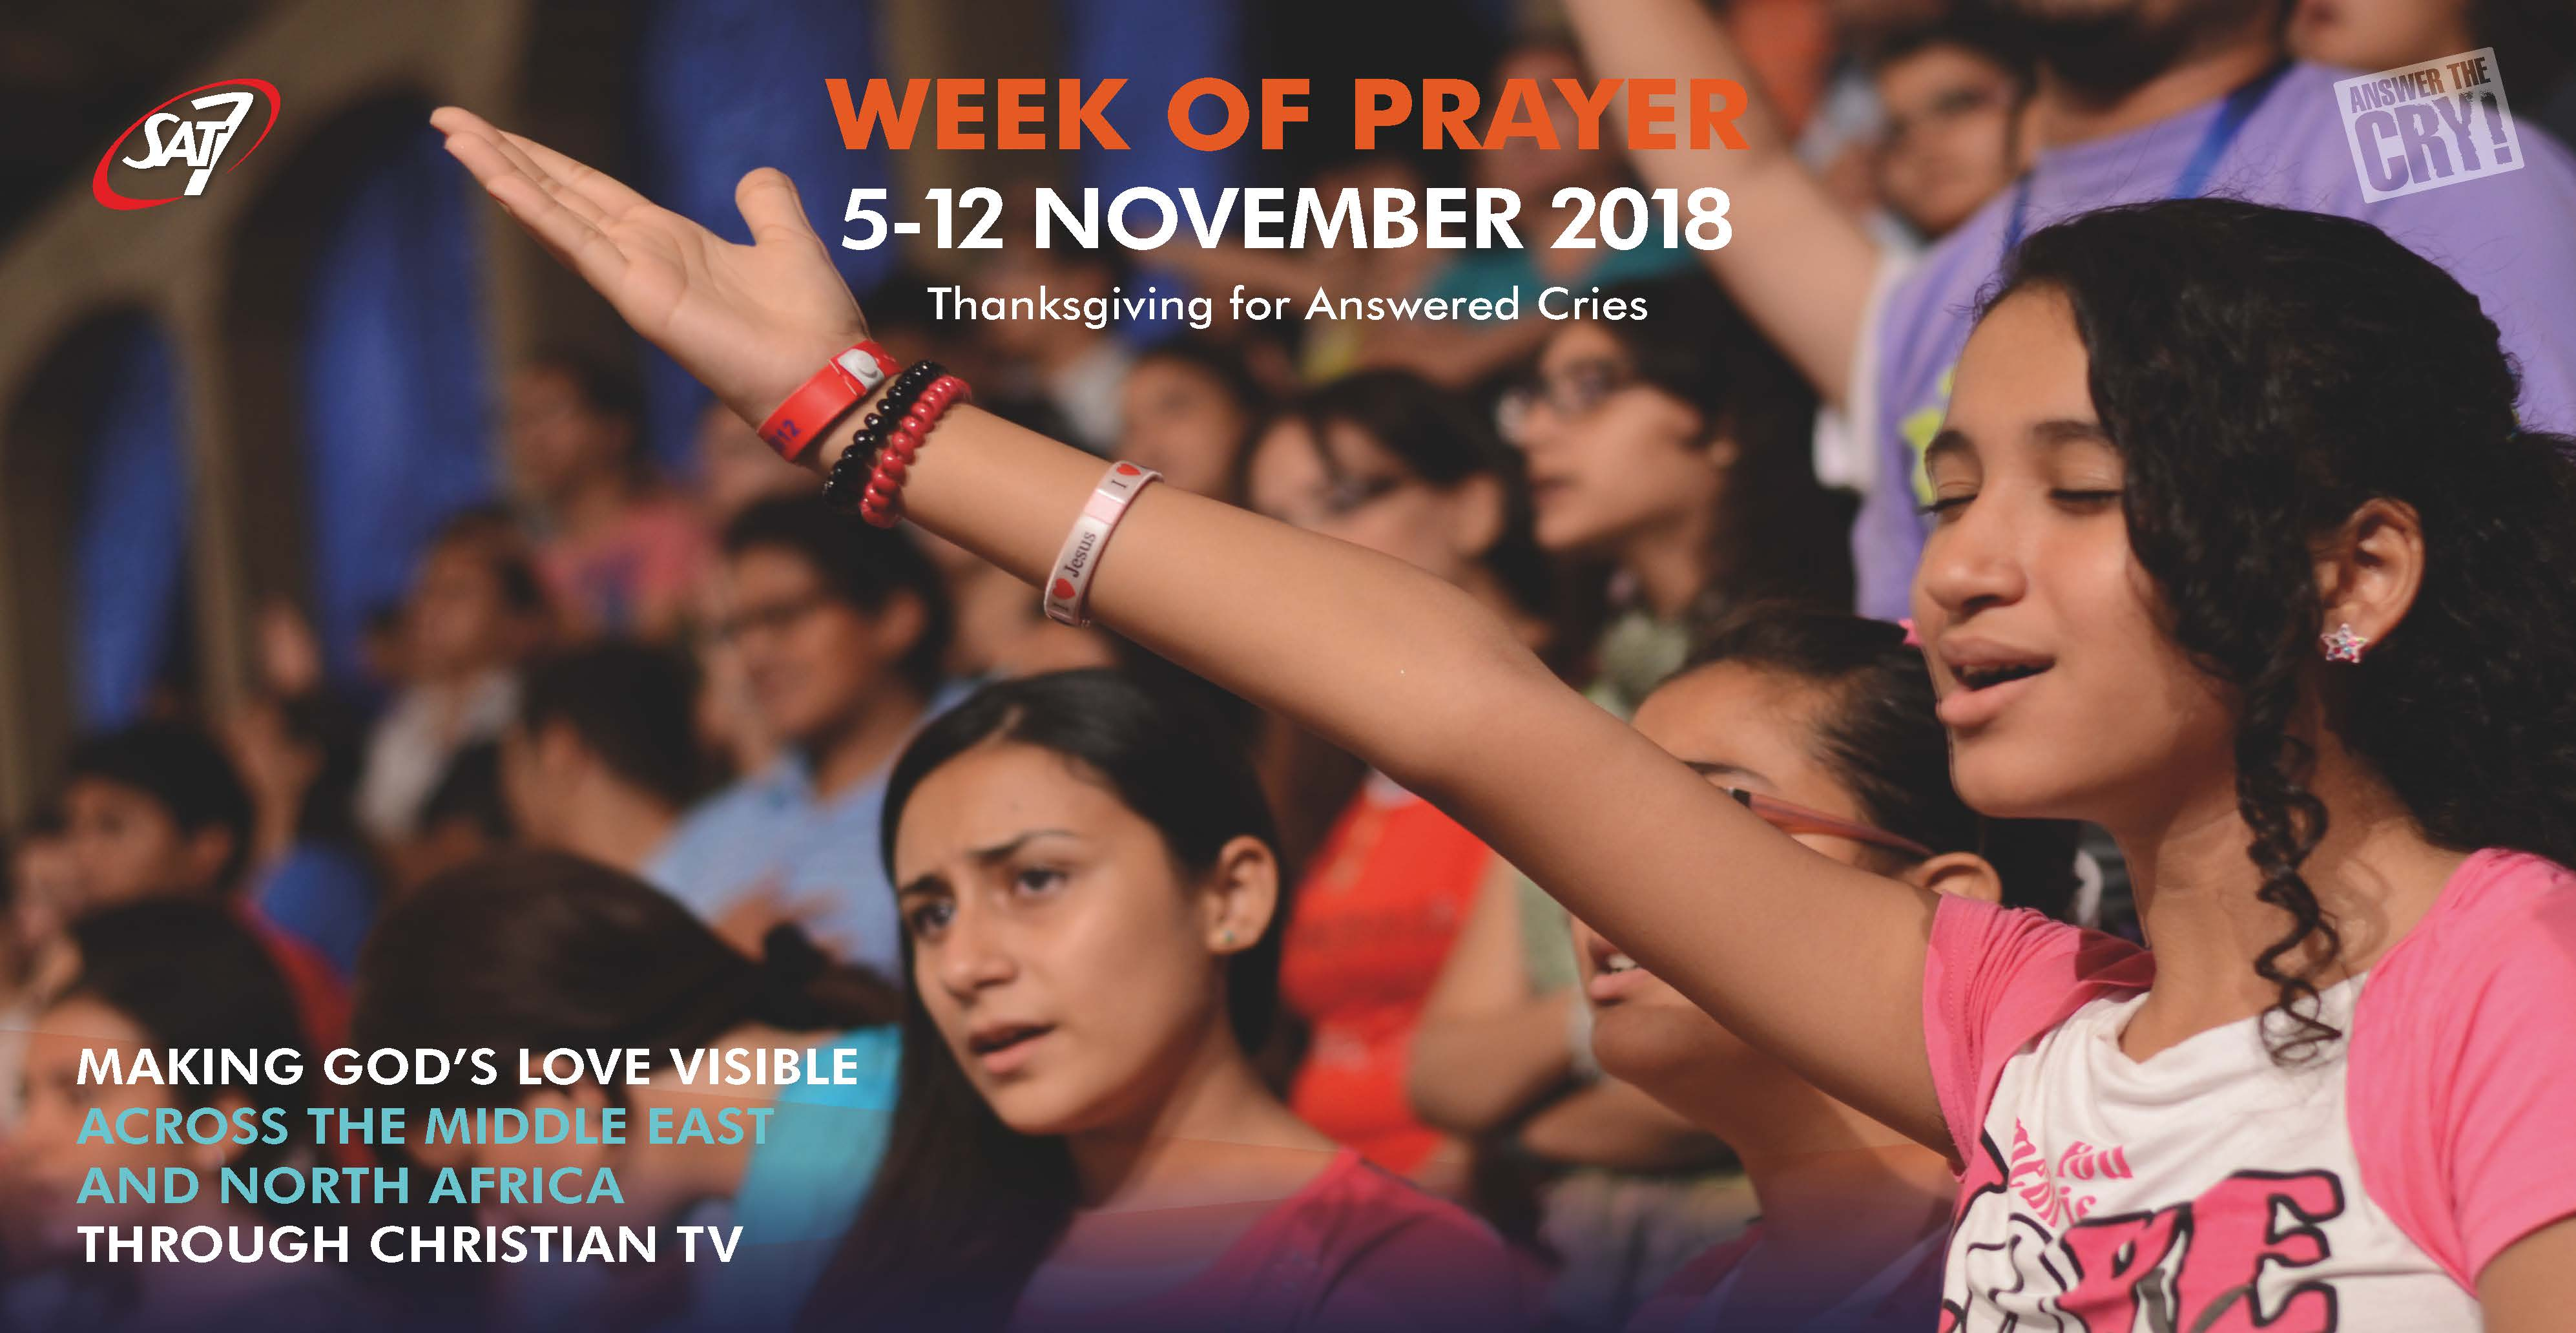 Week of Prayer » SAT-7 UK